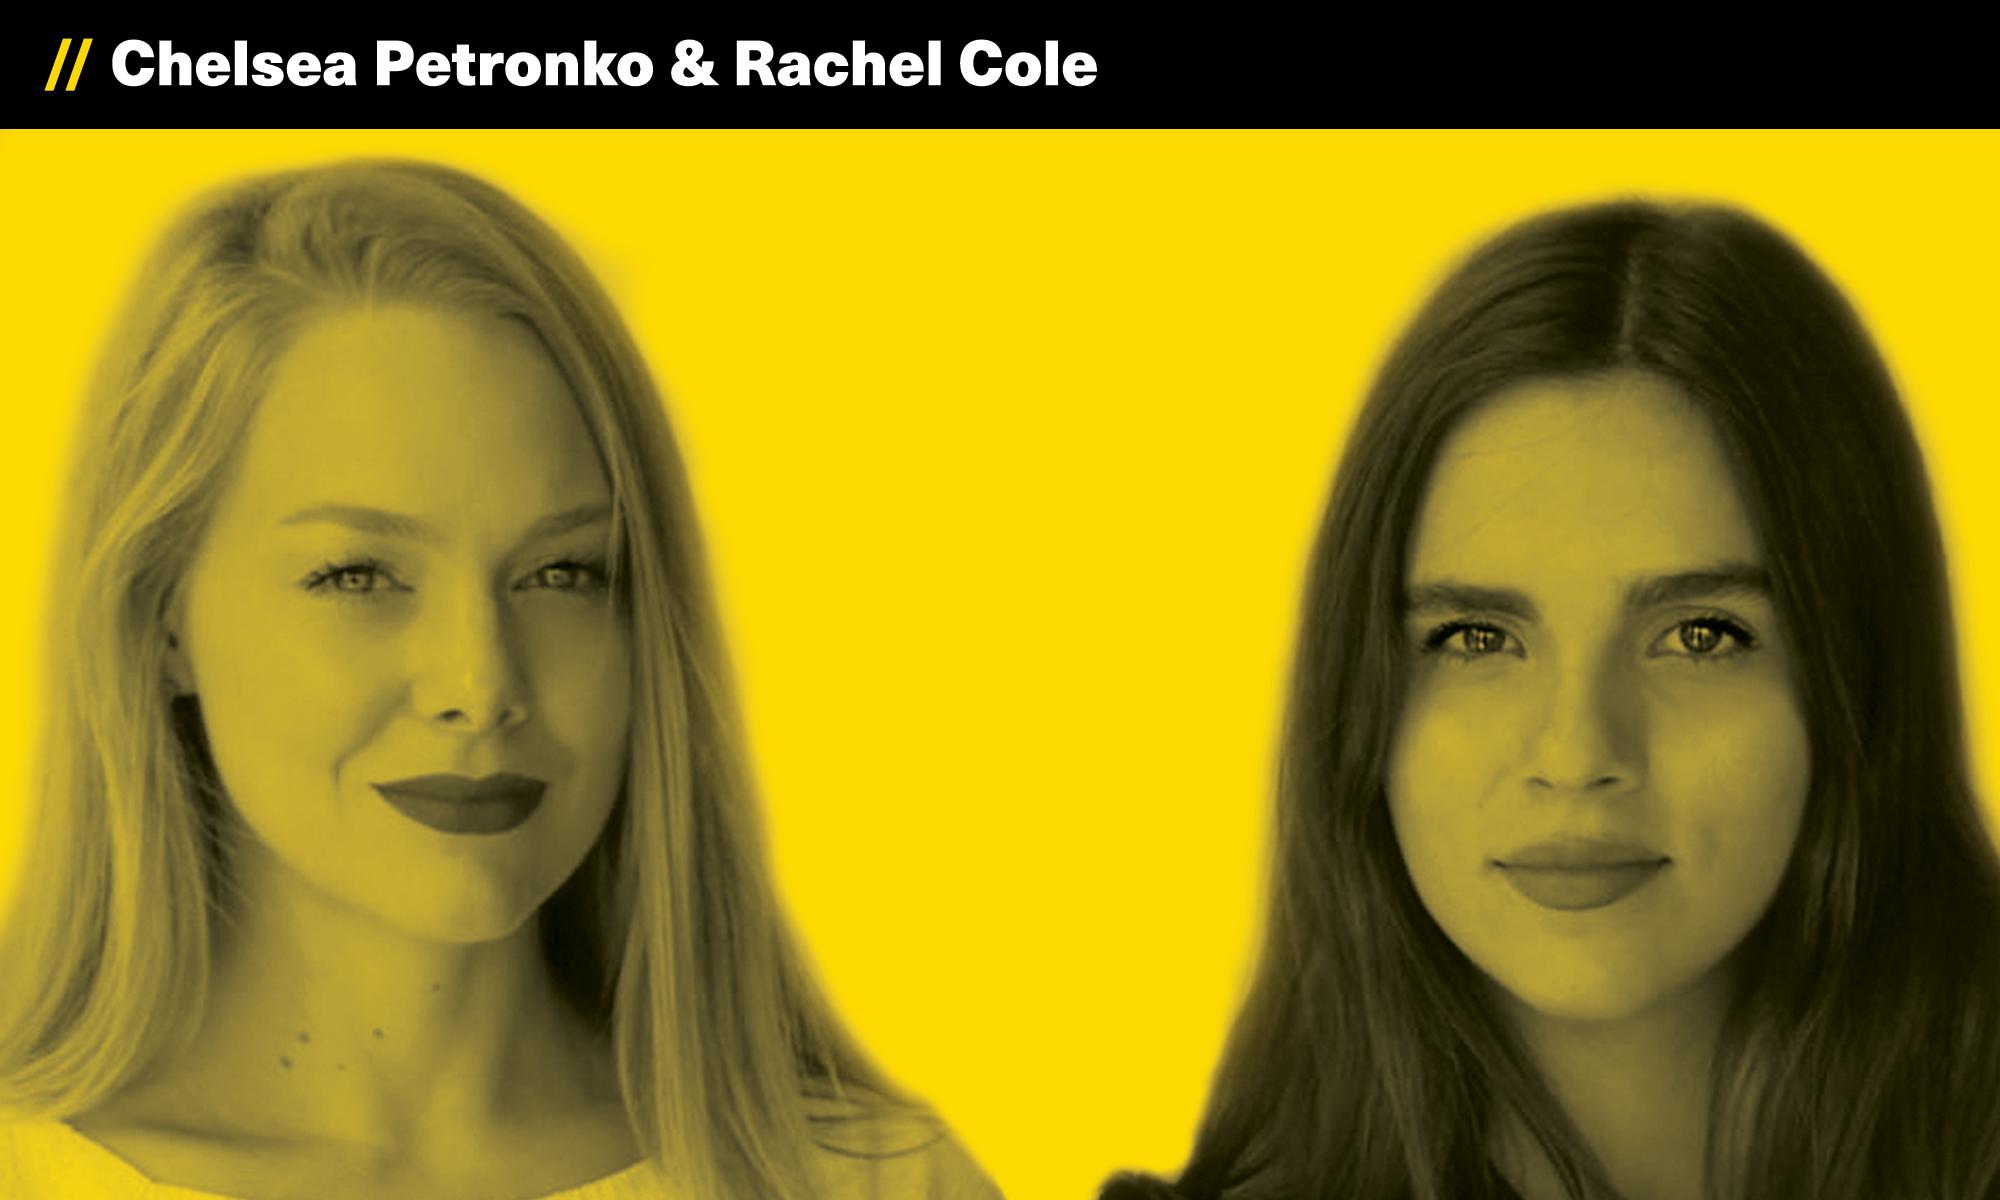 Chelsea Petronko, Rachel Cole, Vernissage Art Advisory, The Founder Hour, Podcast